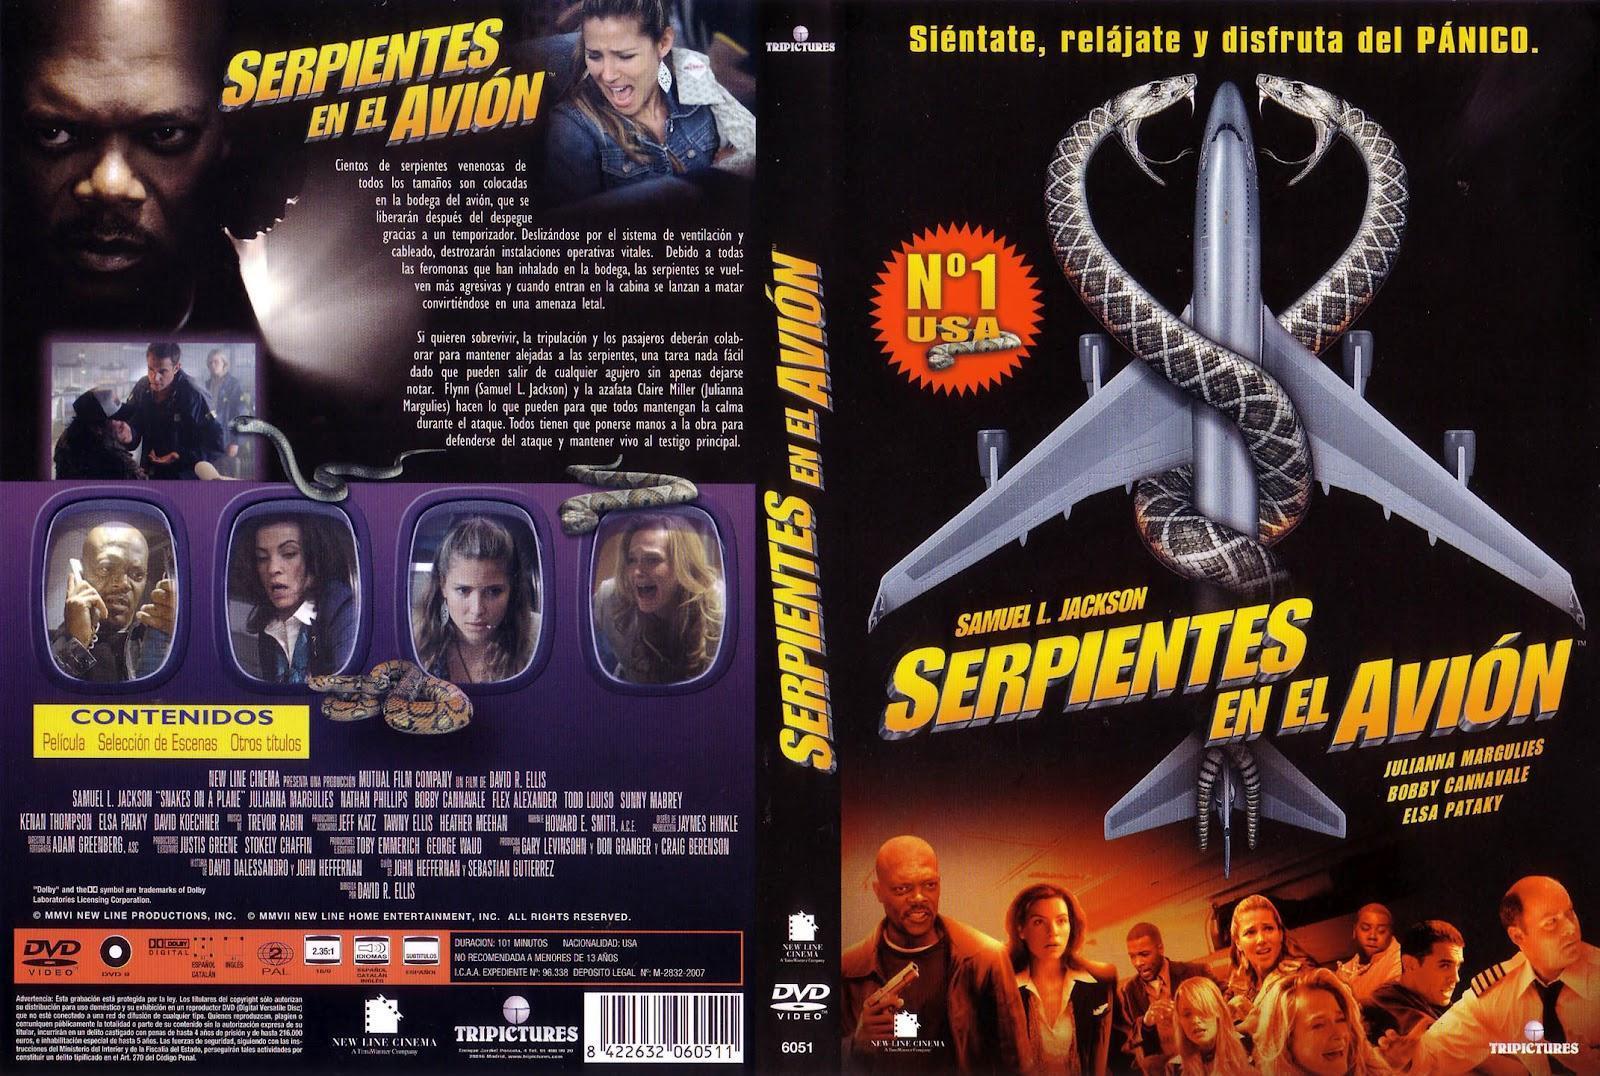 Serpientes A Bordo 2006 Filmaffinity